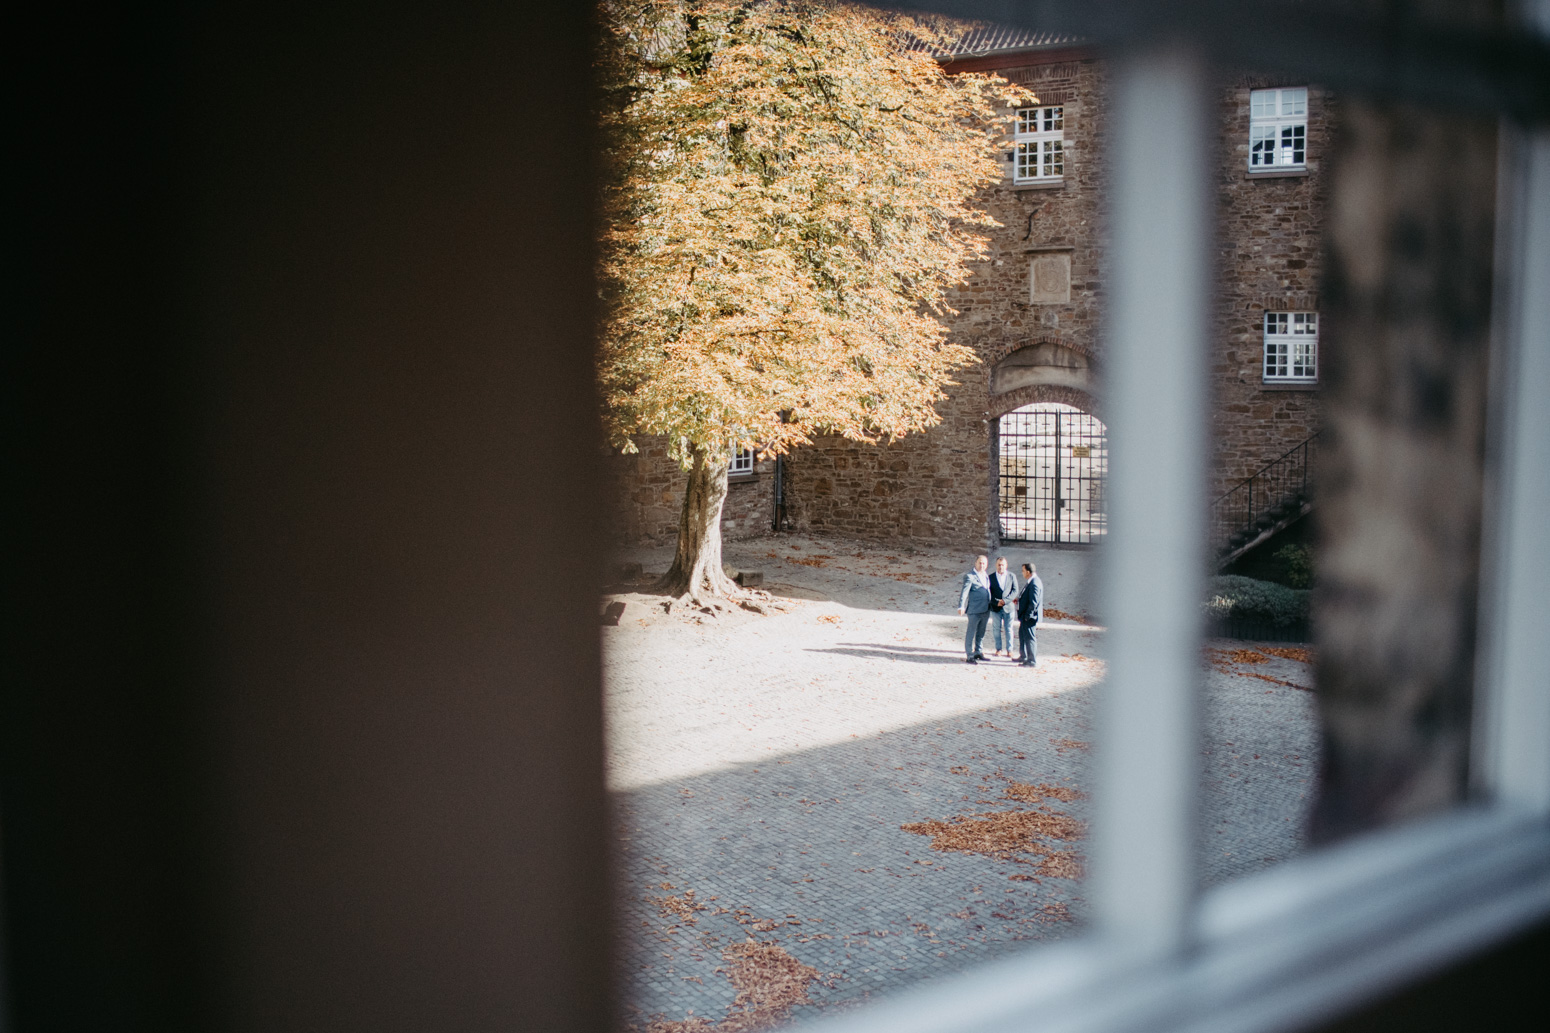 Aussicht auf den Hof des Schloss Broich